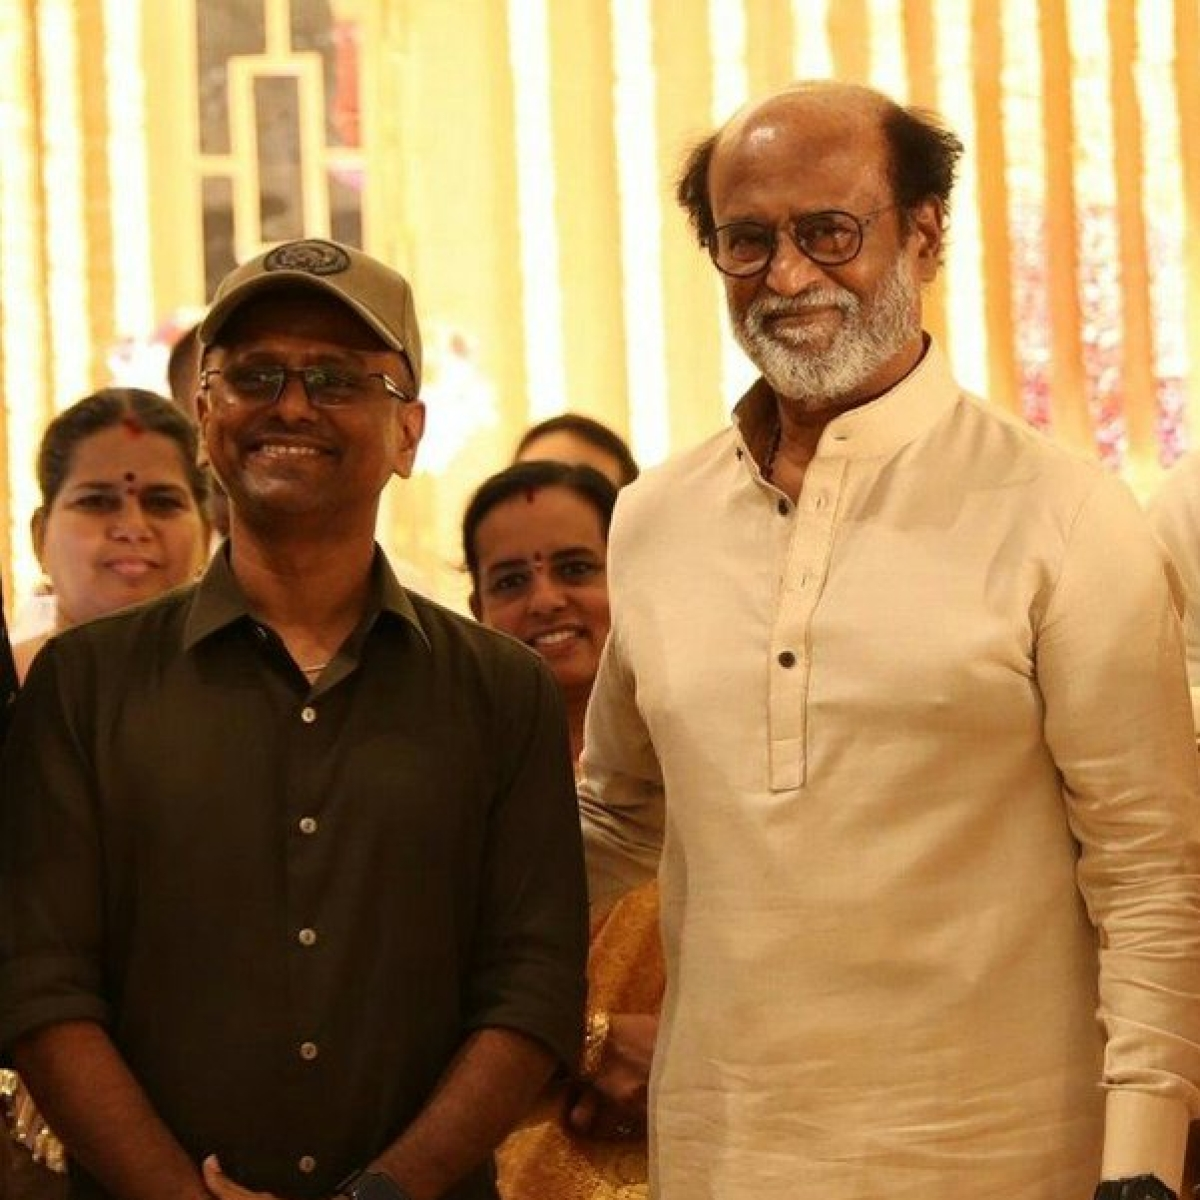 'Message-oriented films with big stars create awareness': A R Murugadoss on Rajinikanth's 'Darbar'